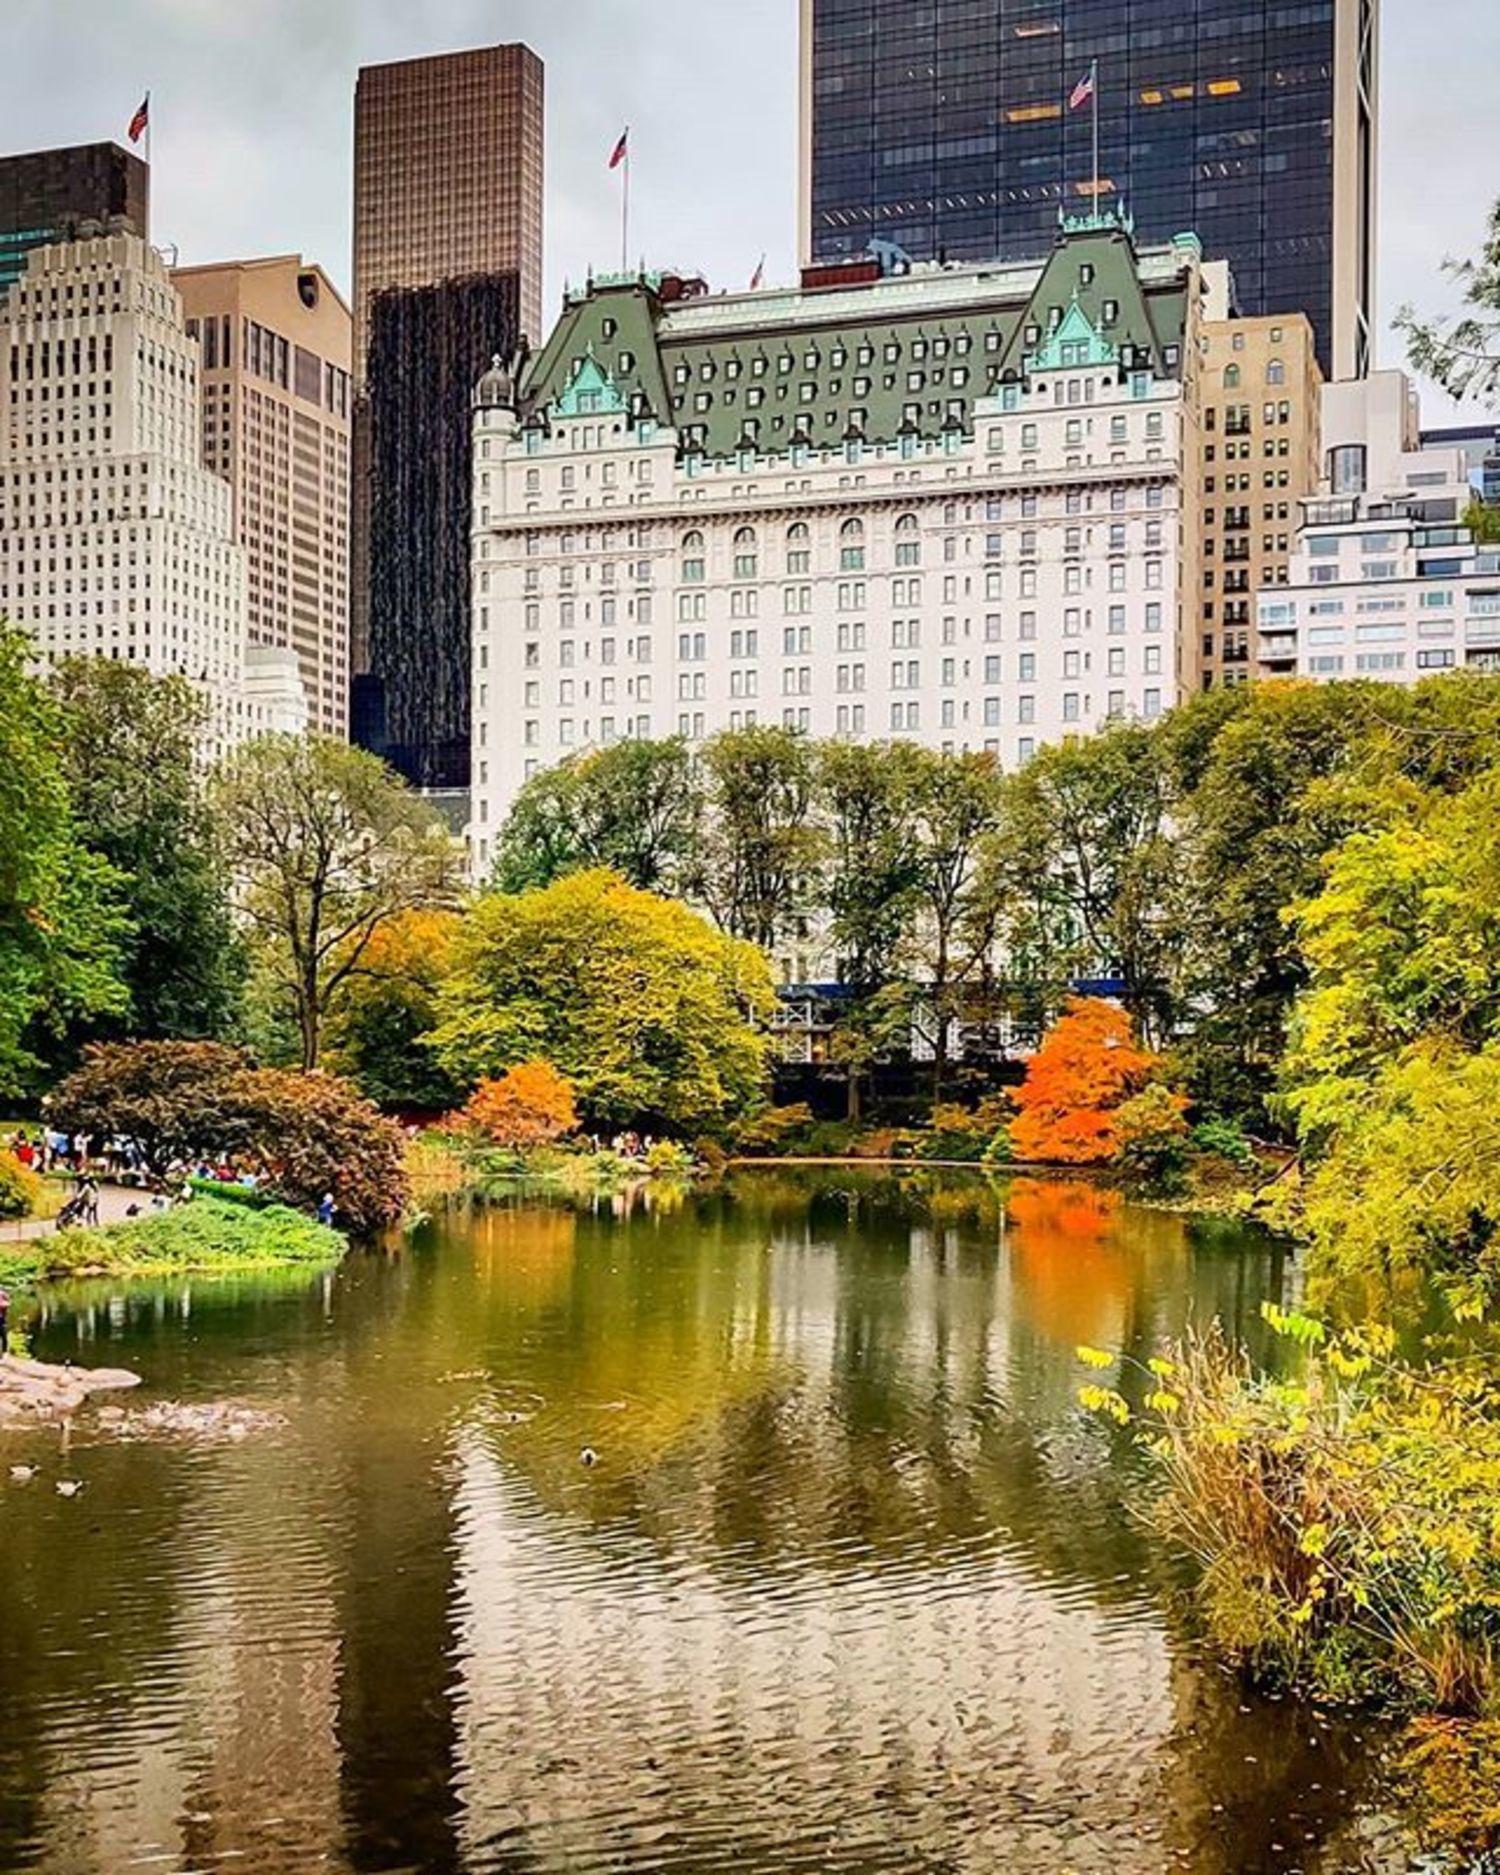 Plaza Hotel from Central Park, Manhattan